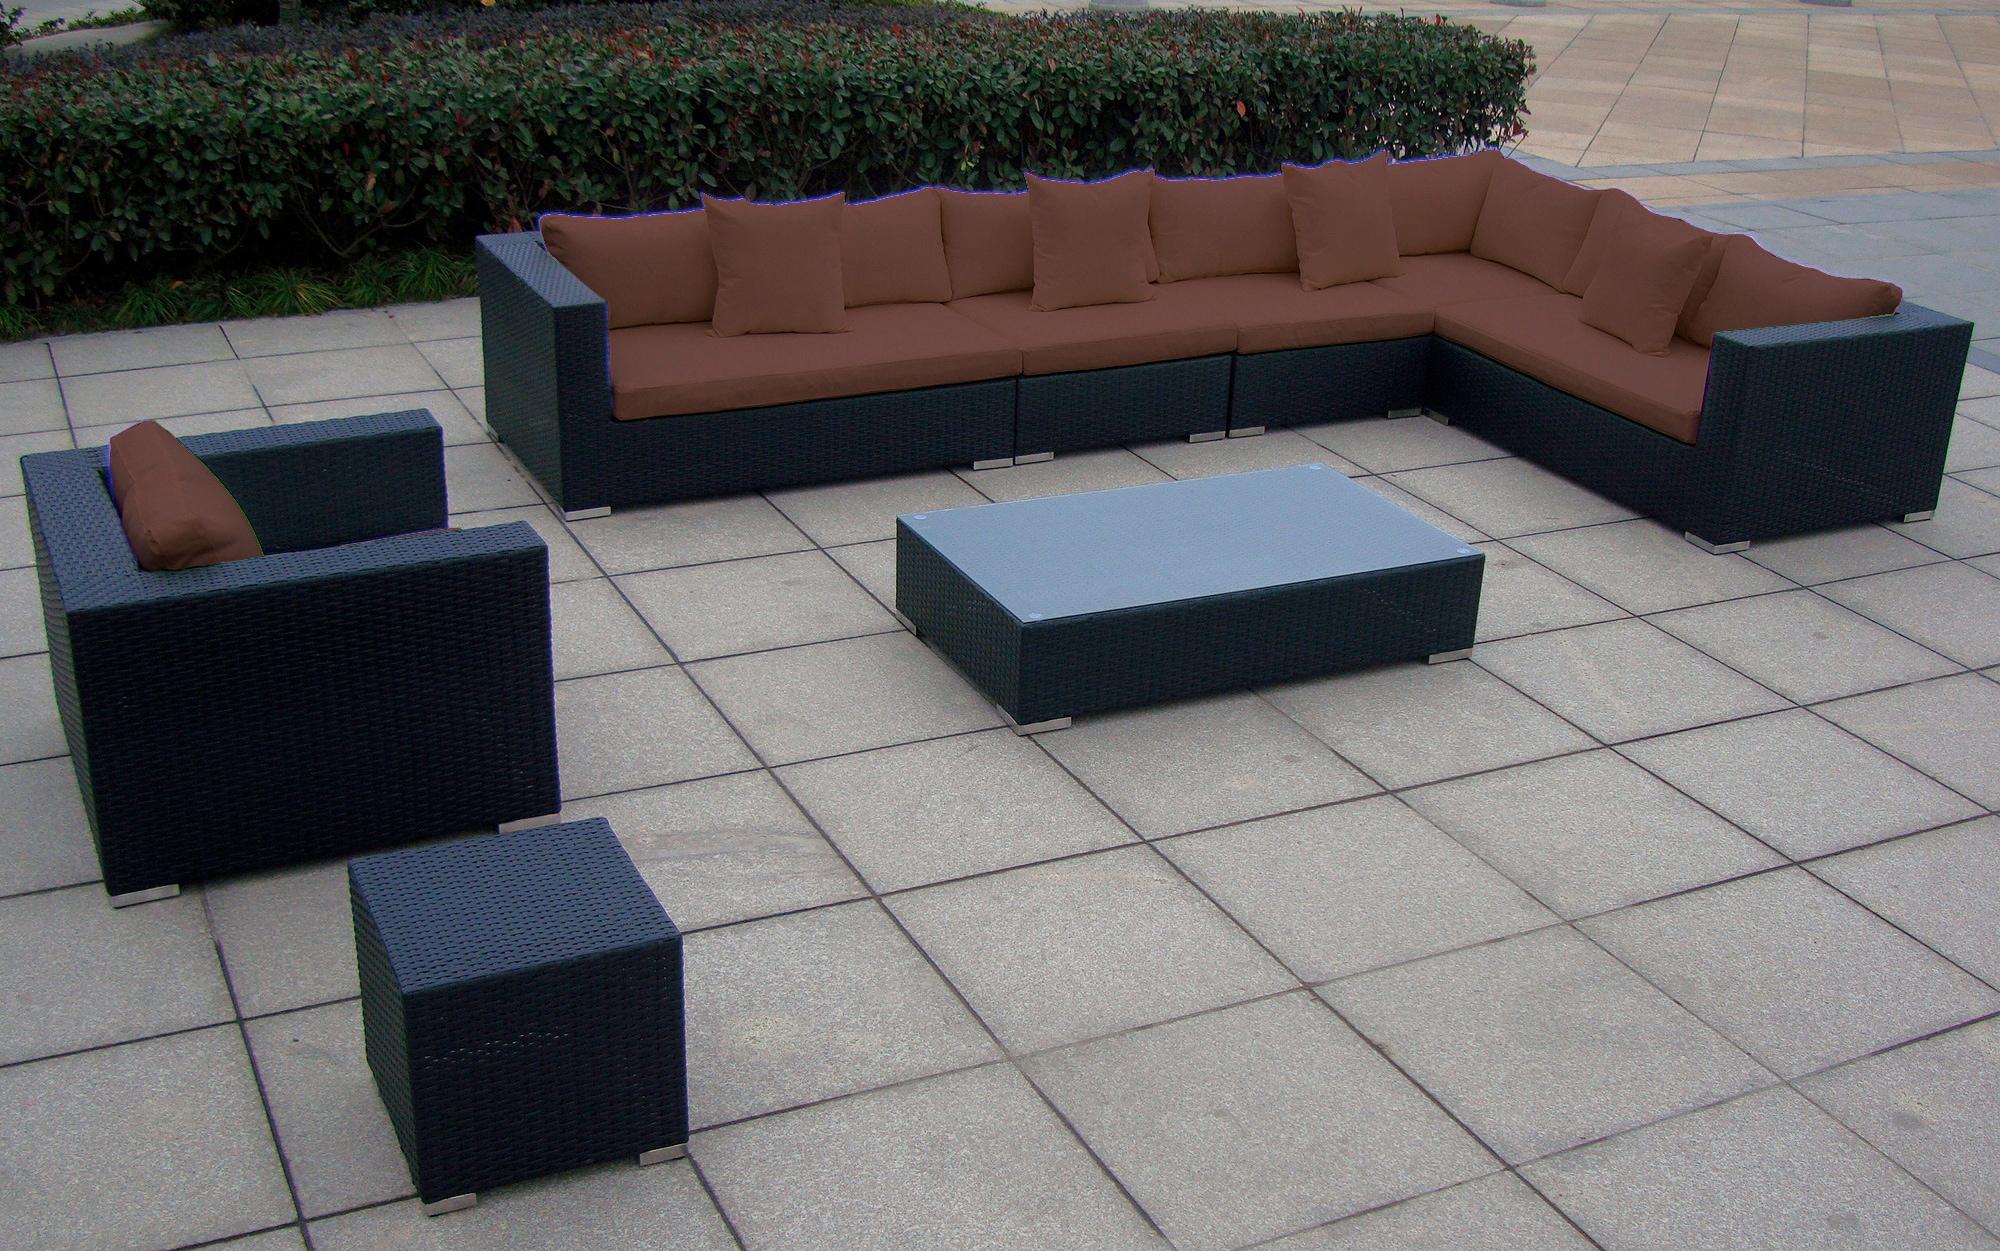 BAIDANI Loungeset Sunmaster 1 XXL Sofa 1 Sessel 1 Tisch 1 Beistelltisch Polyrattan